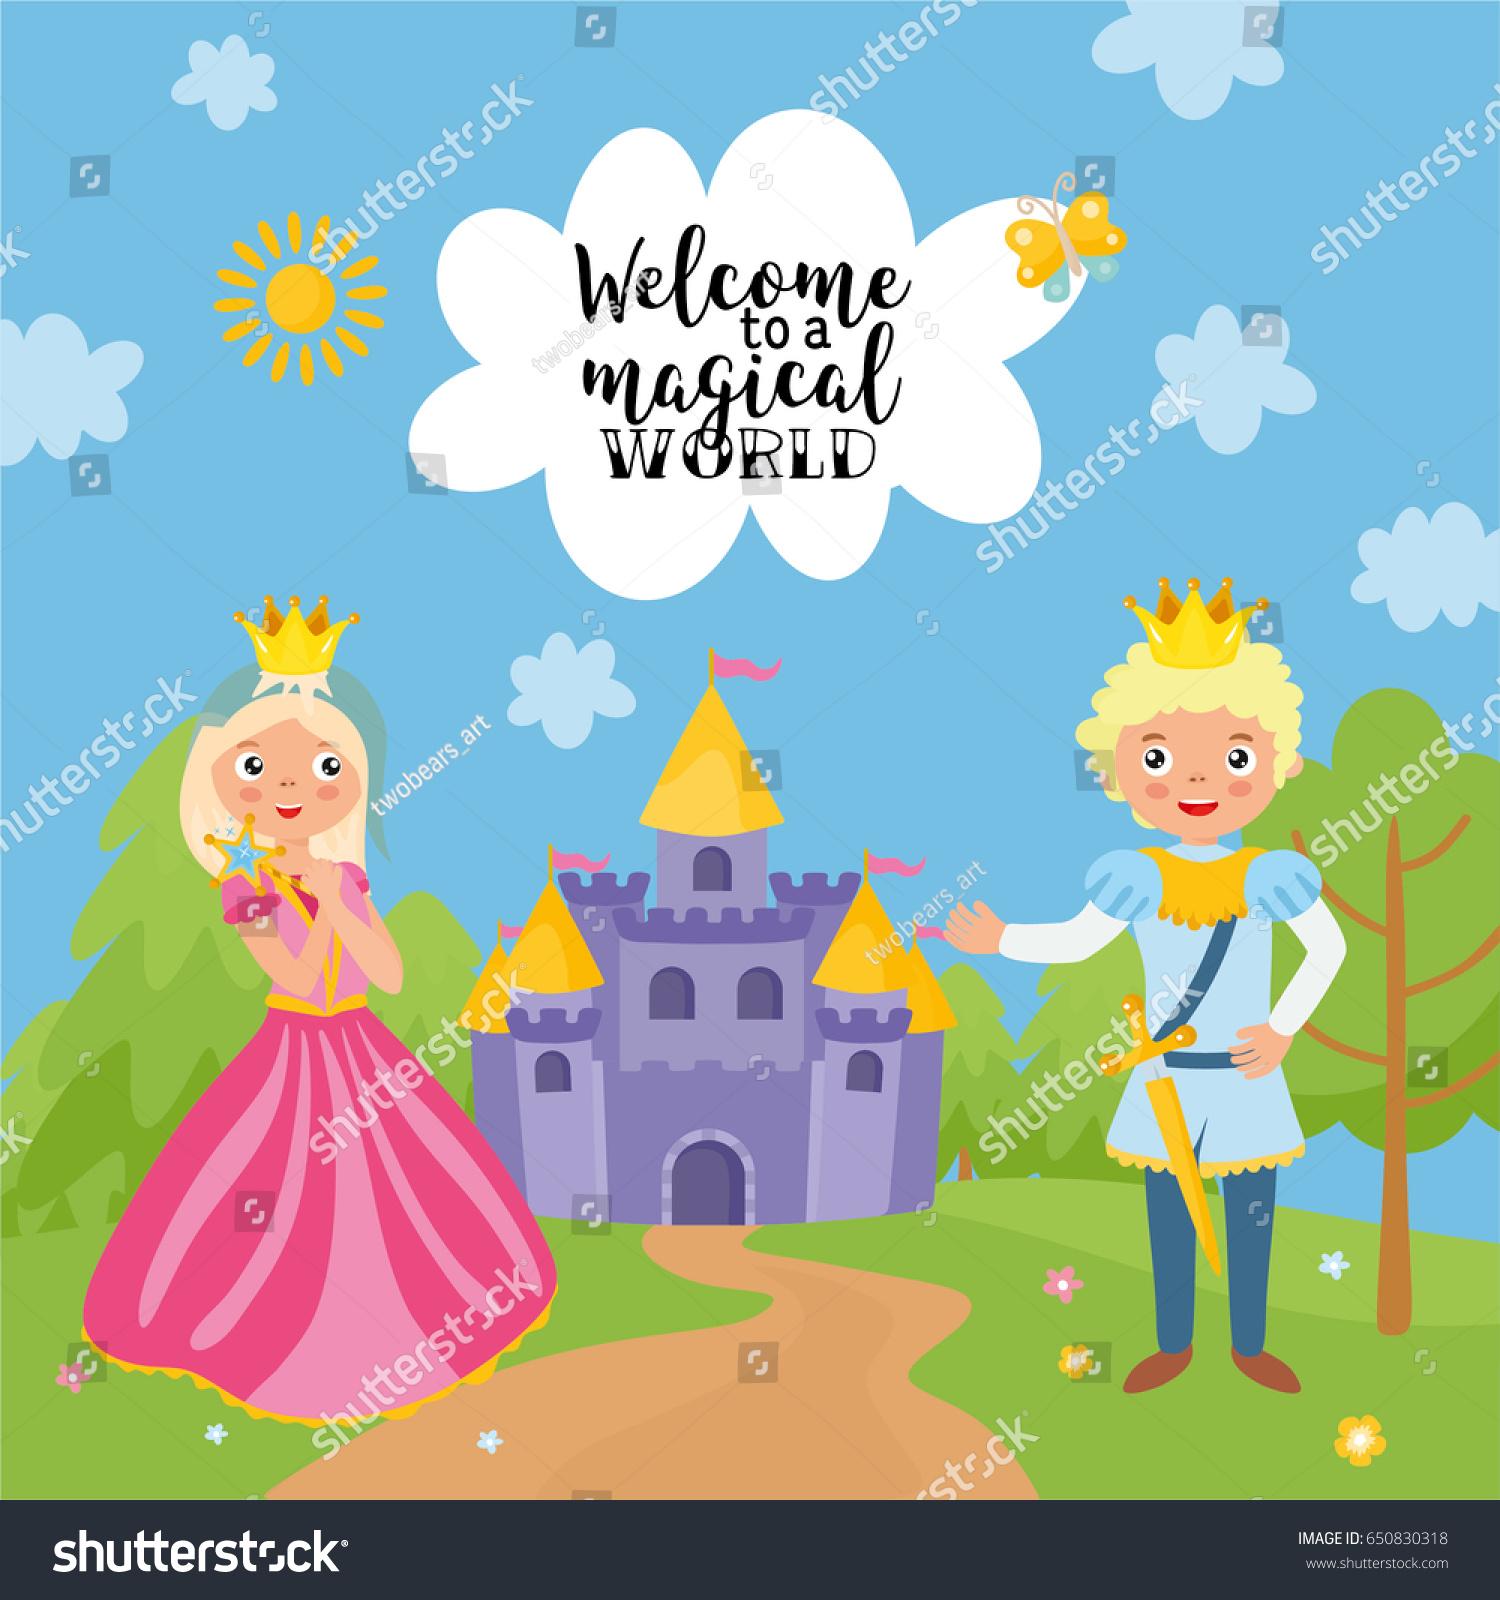 Welcome magical world greeting card magic stock vector 650830318 welcome to a magical world greeting card magic illustration with prince and princess kristyandbryce Choice Image